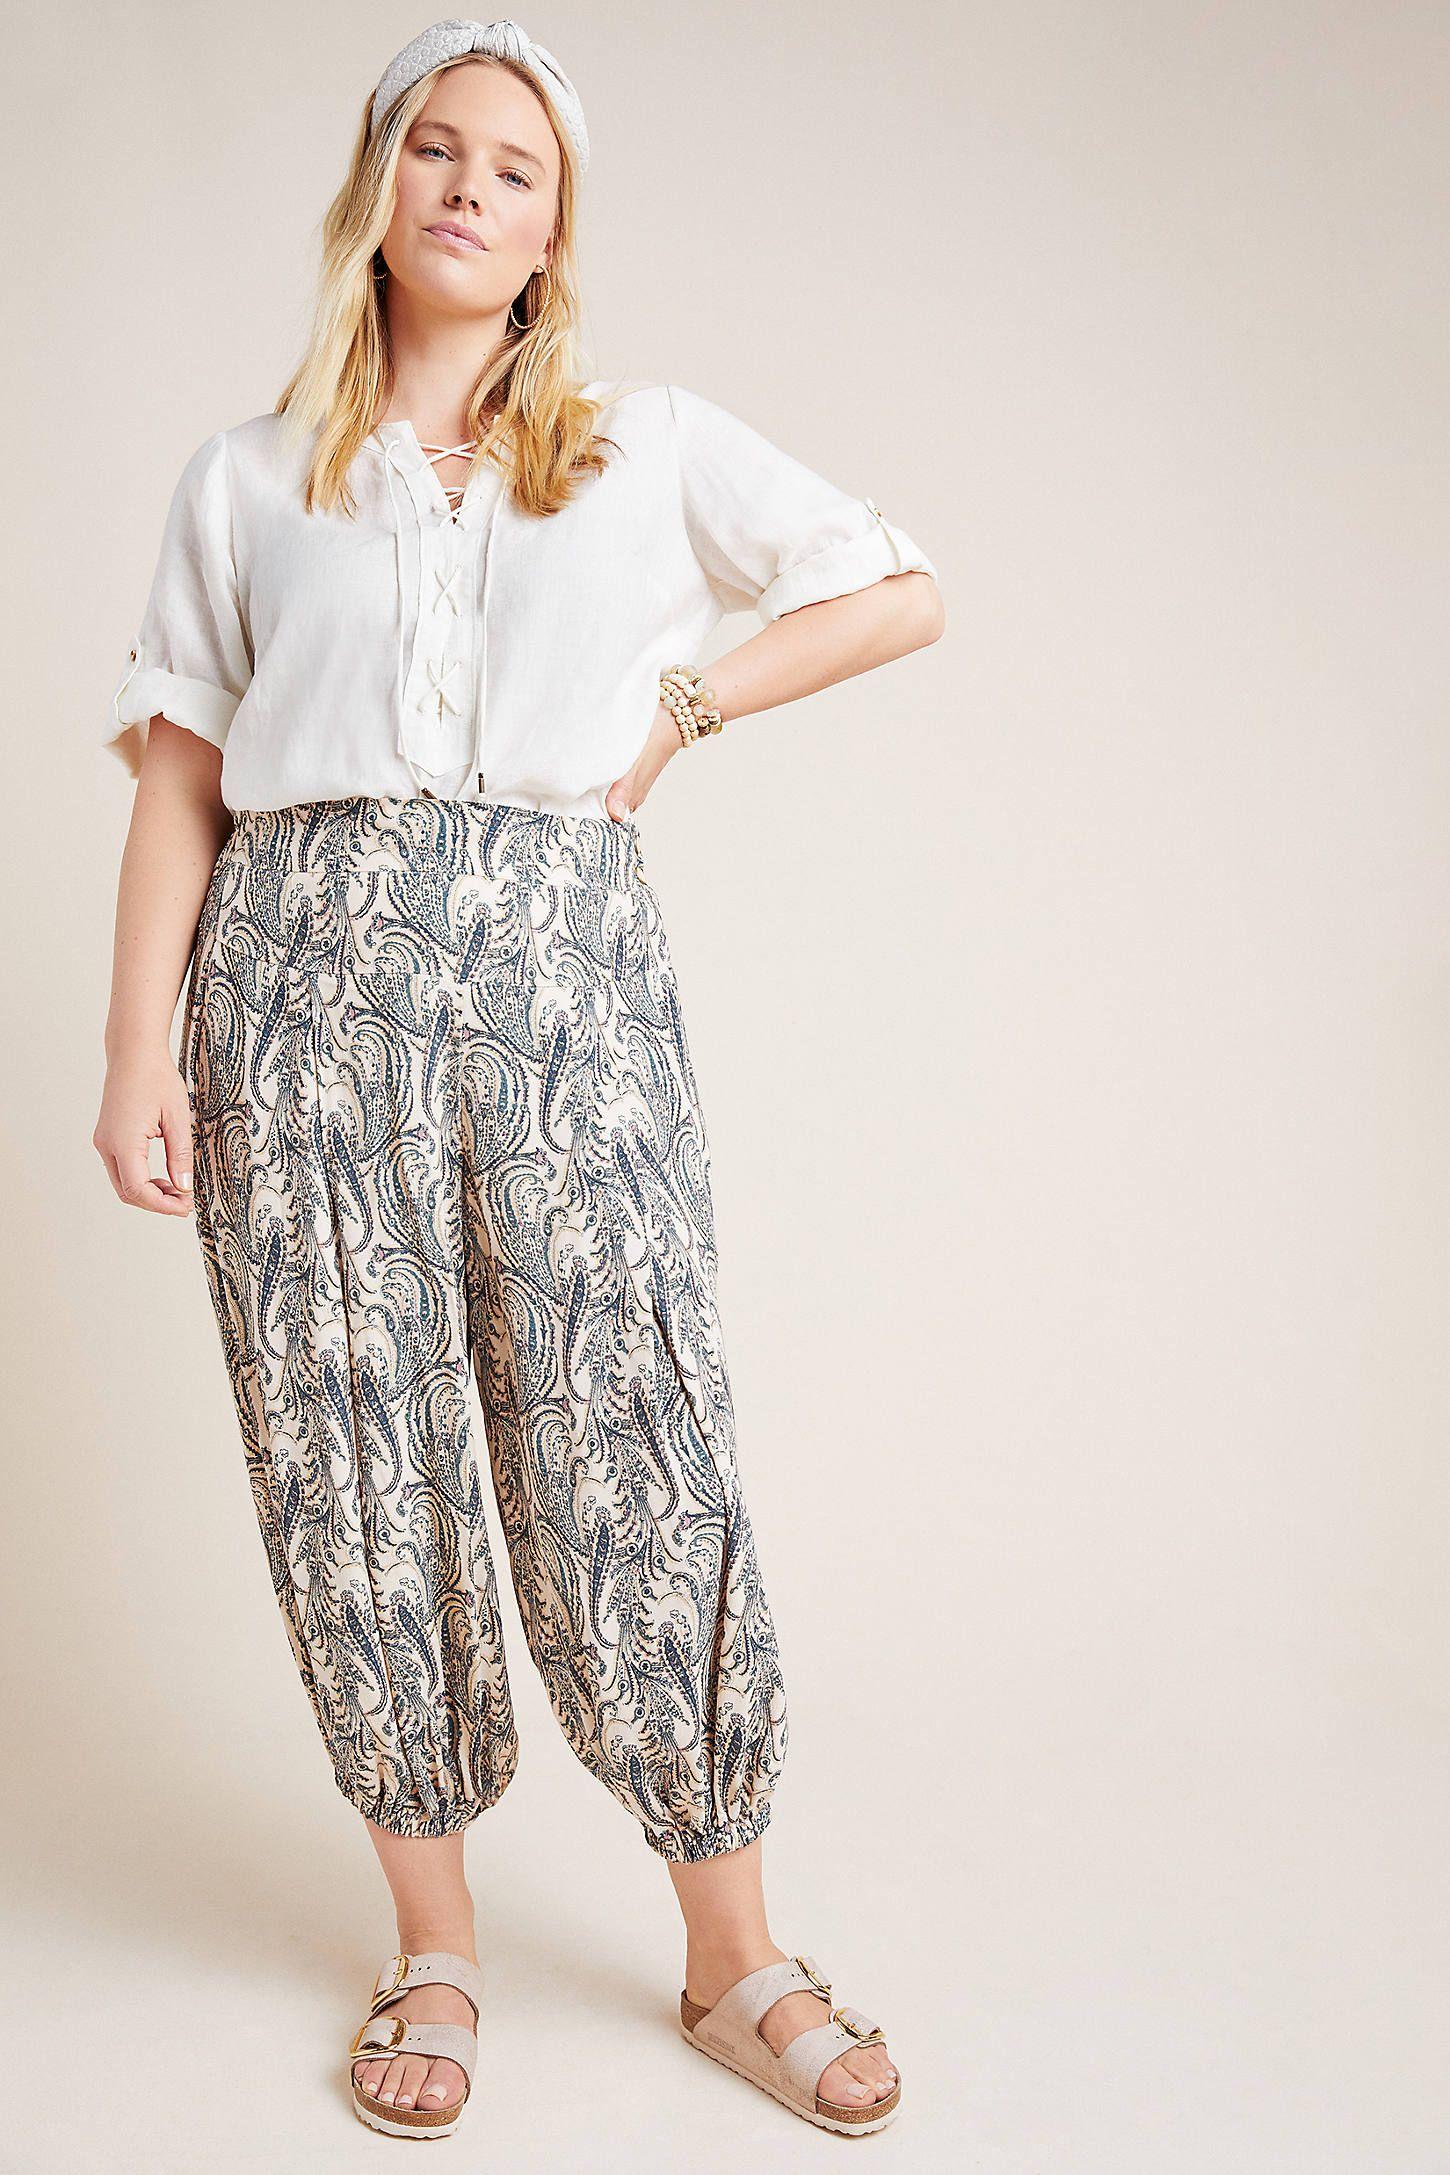 Womens Plus Size Harem Pants NZ   Buy New Womens Plus Size